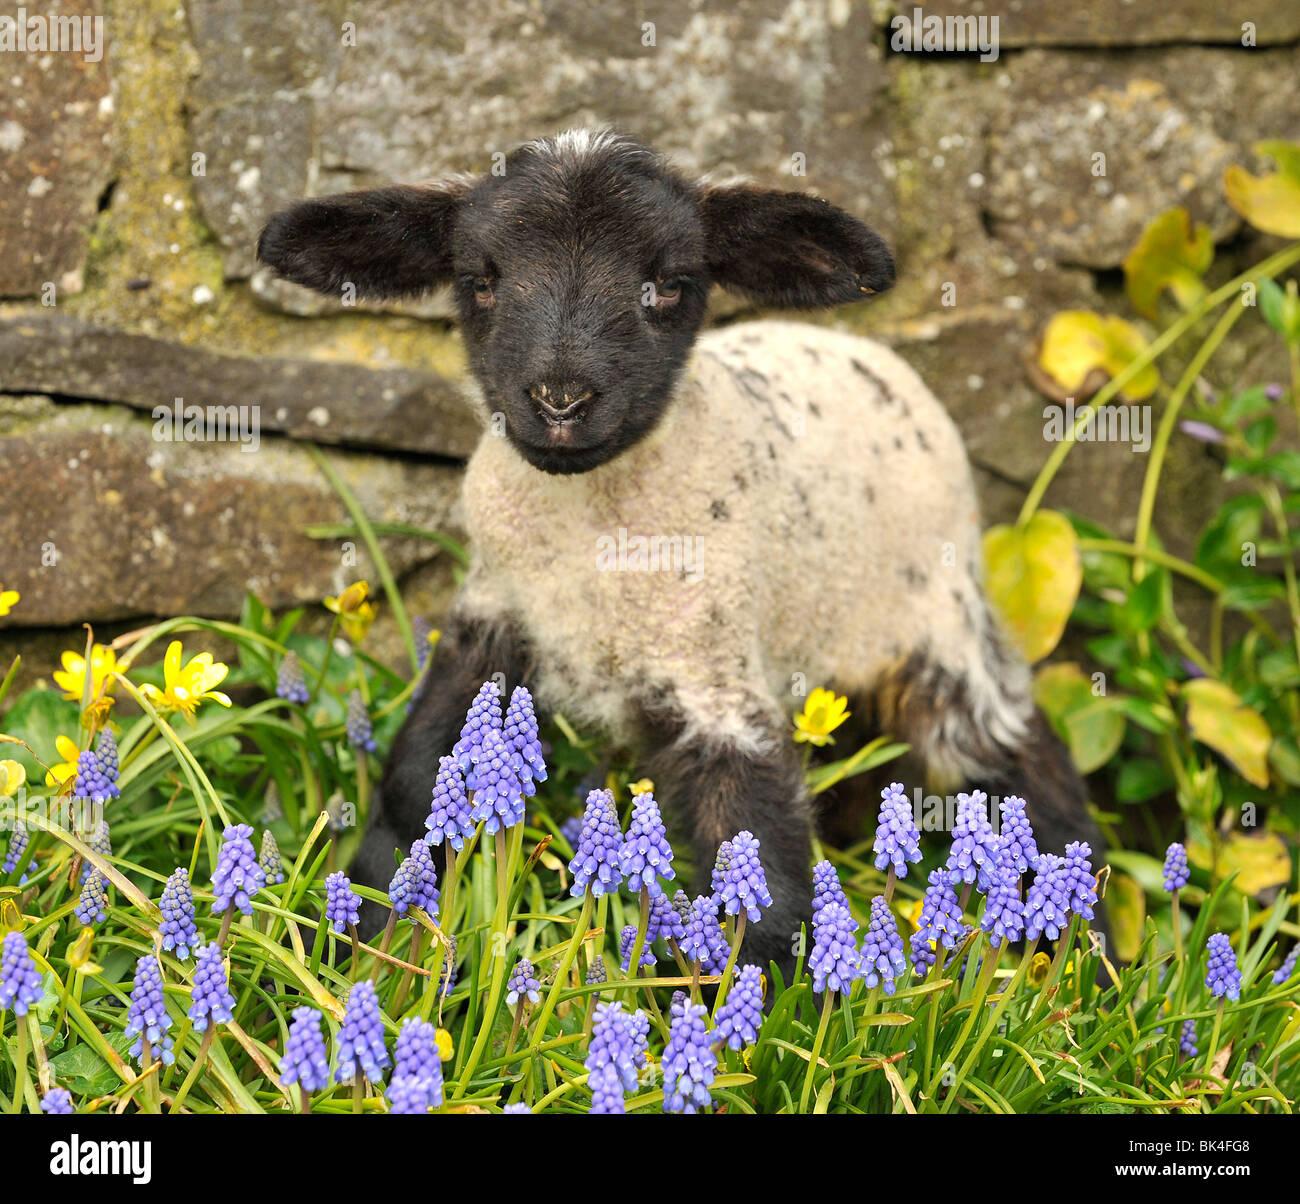 lamb in spring flowers uk stock photo royalty free image